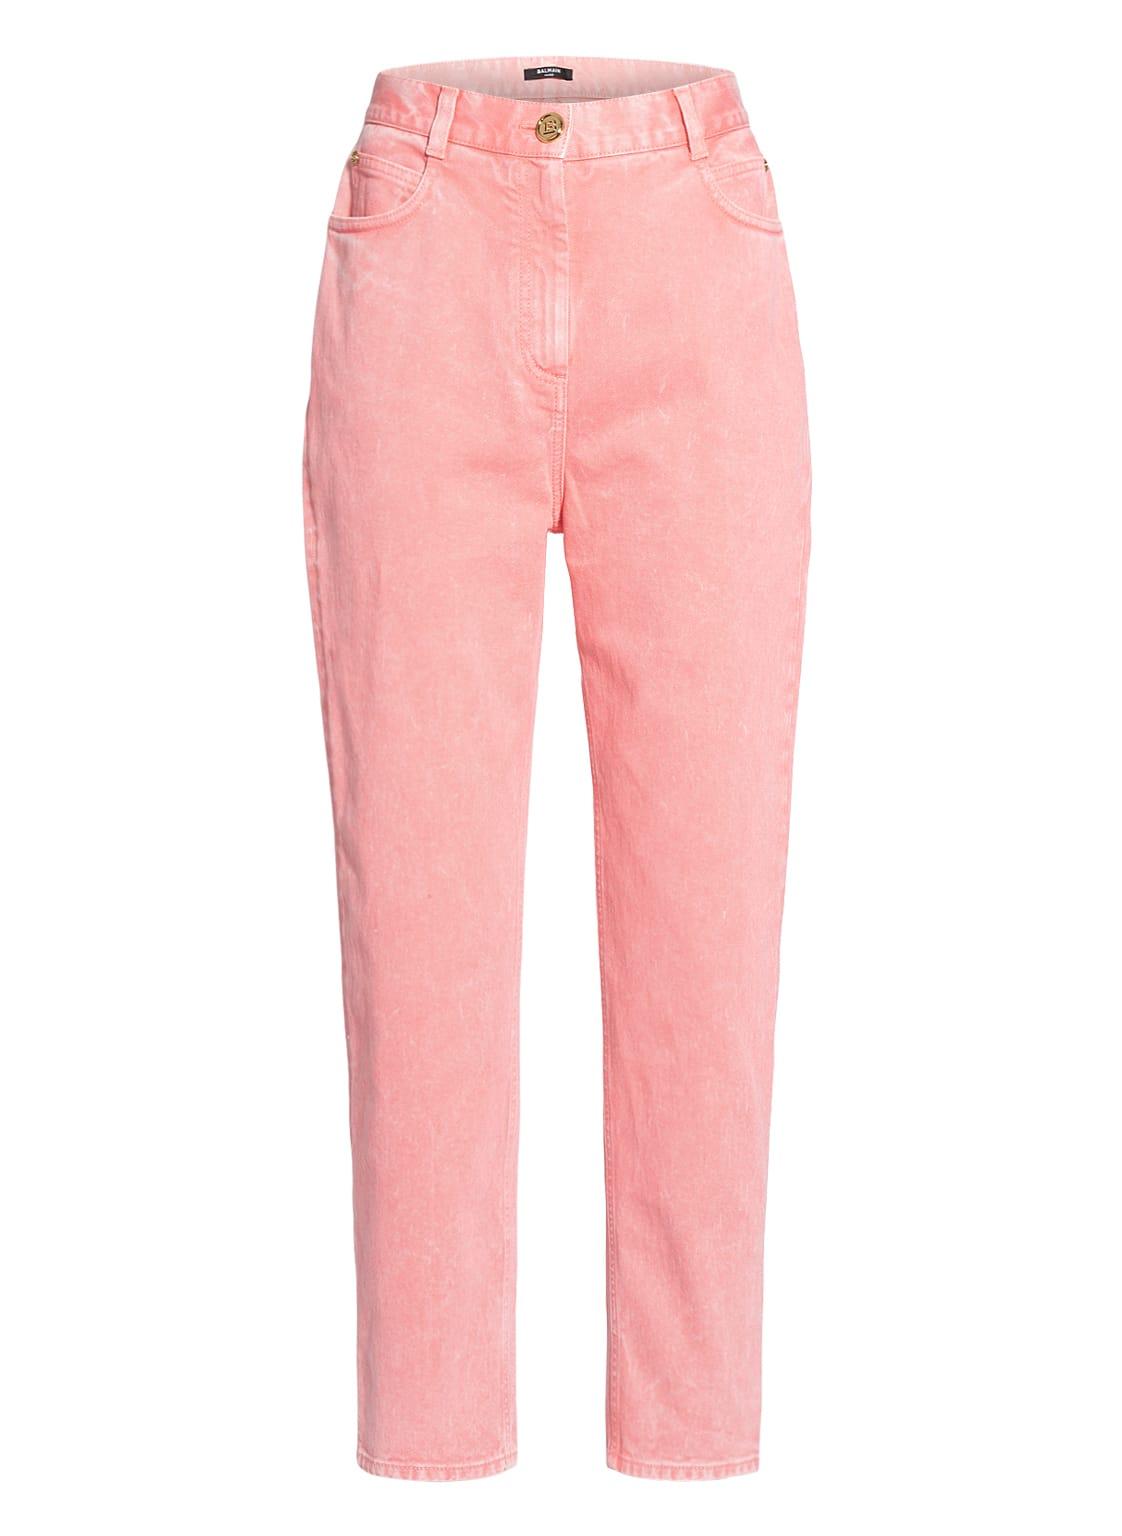 Image of Balmain 7/8-Jeans rosa